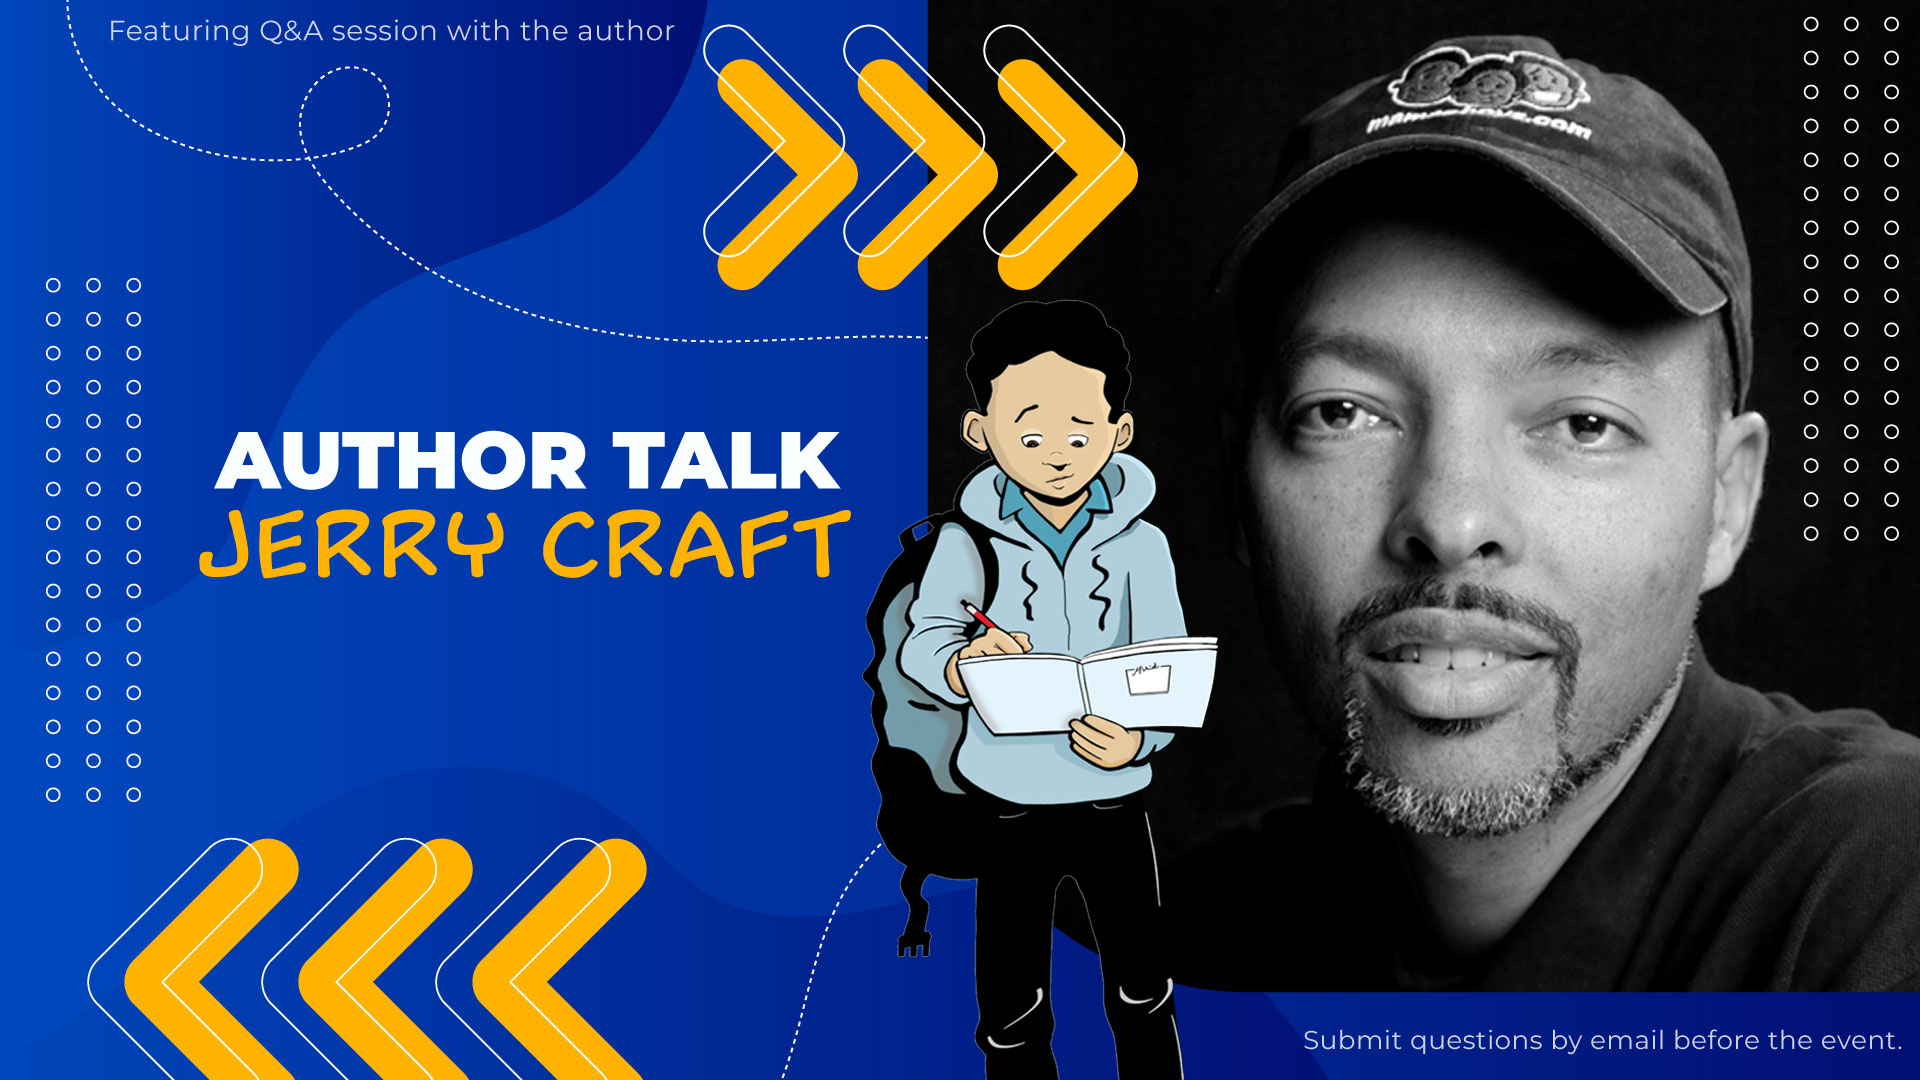 author talk jerry craft